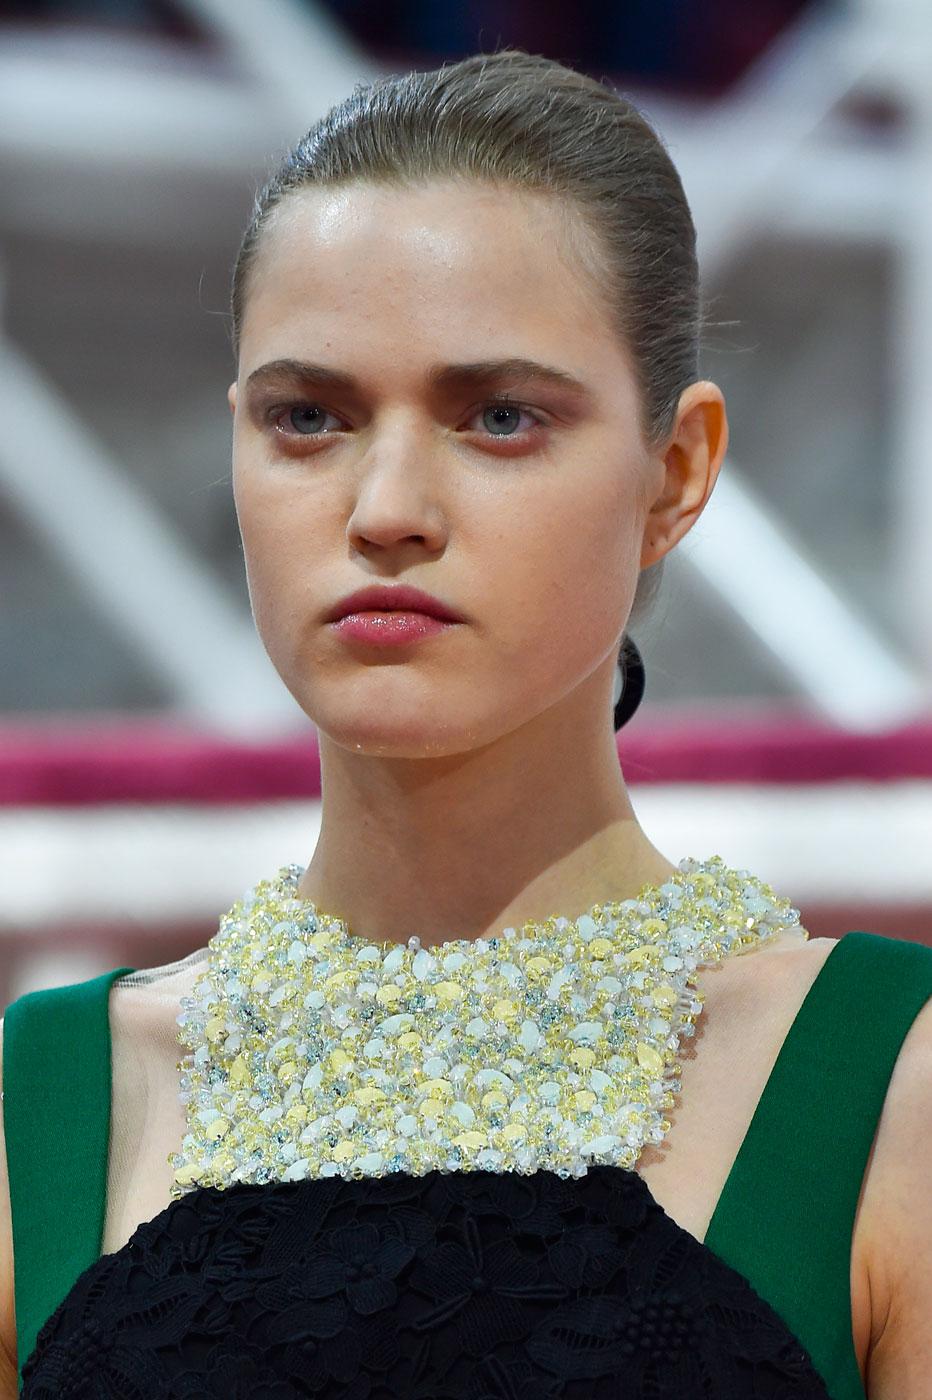 Christian-Dior-fashion-runway-show-close-ups-haute-couture-paris-spring-summer-2015-the-impression-067